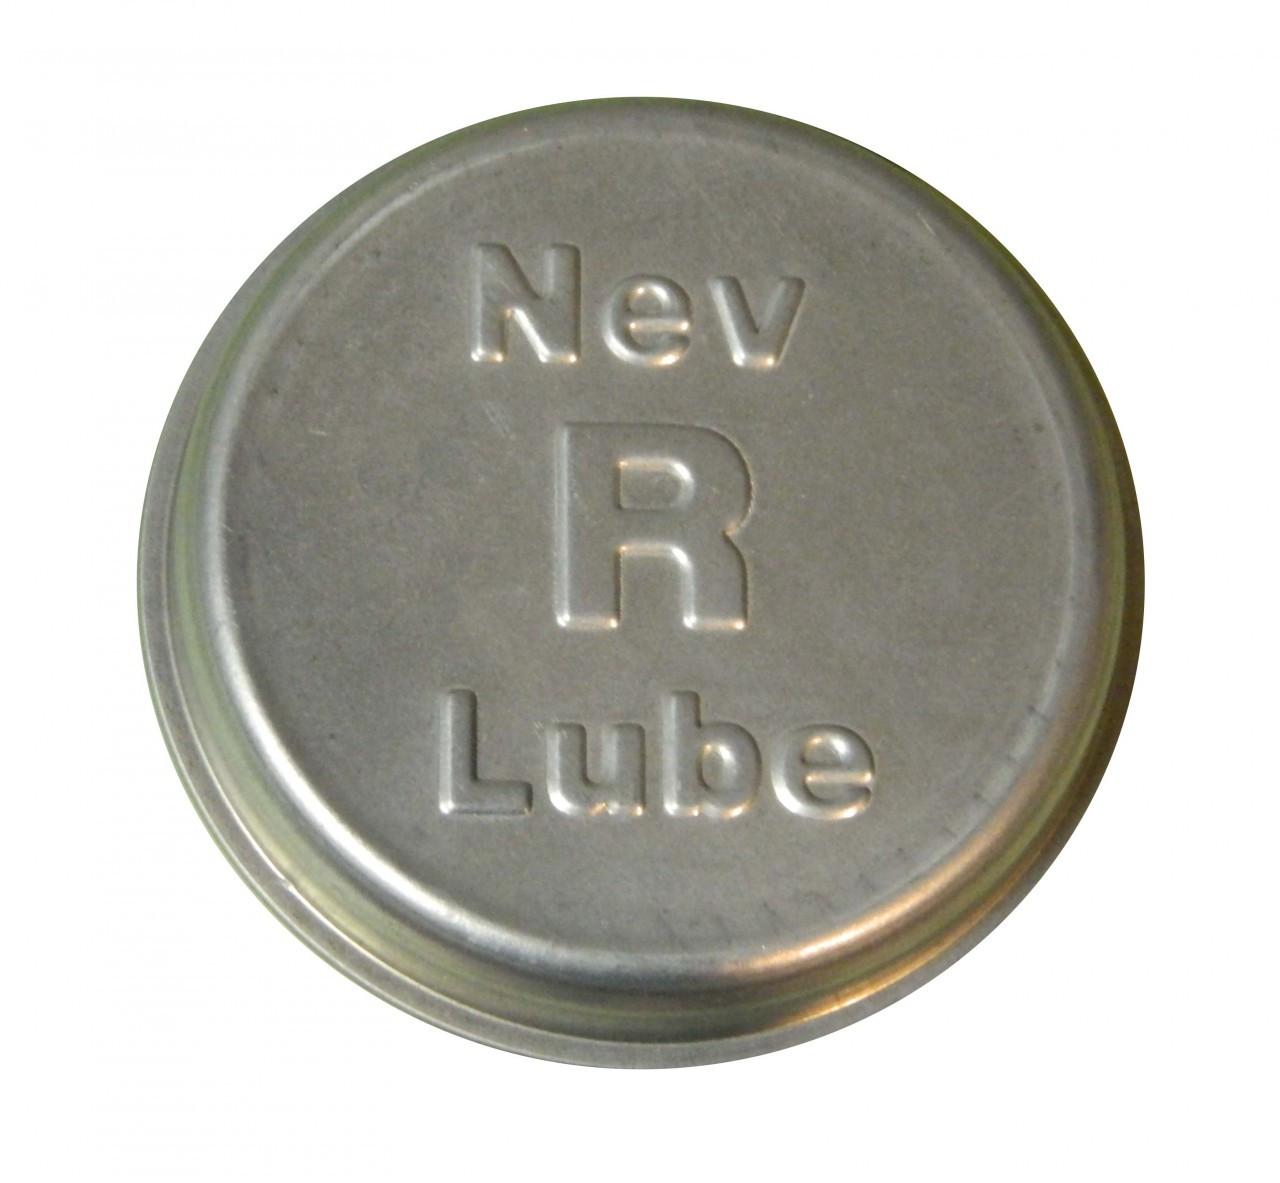 21-85-00 --- Nev-R-Lube 42mm Dust Cap